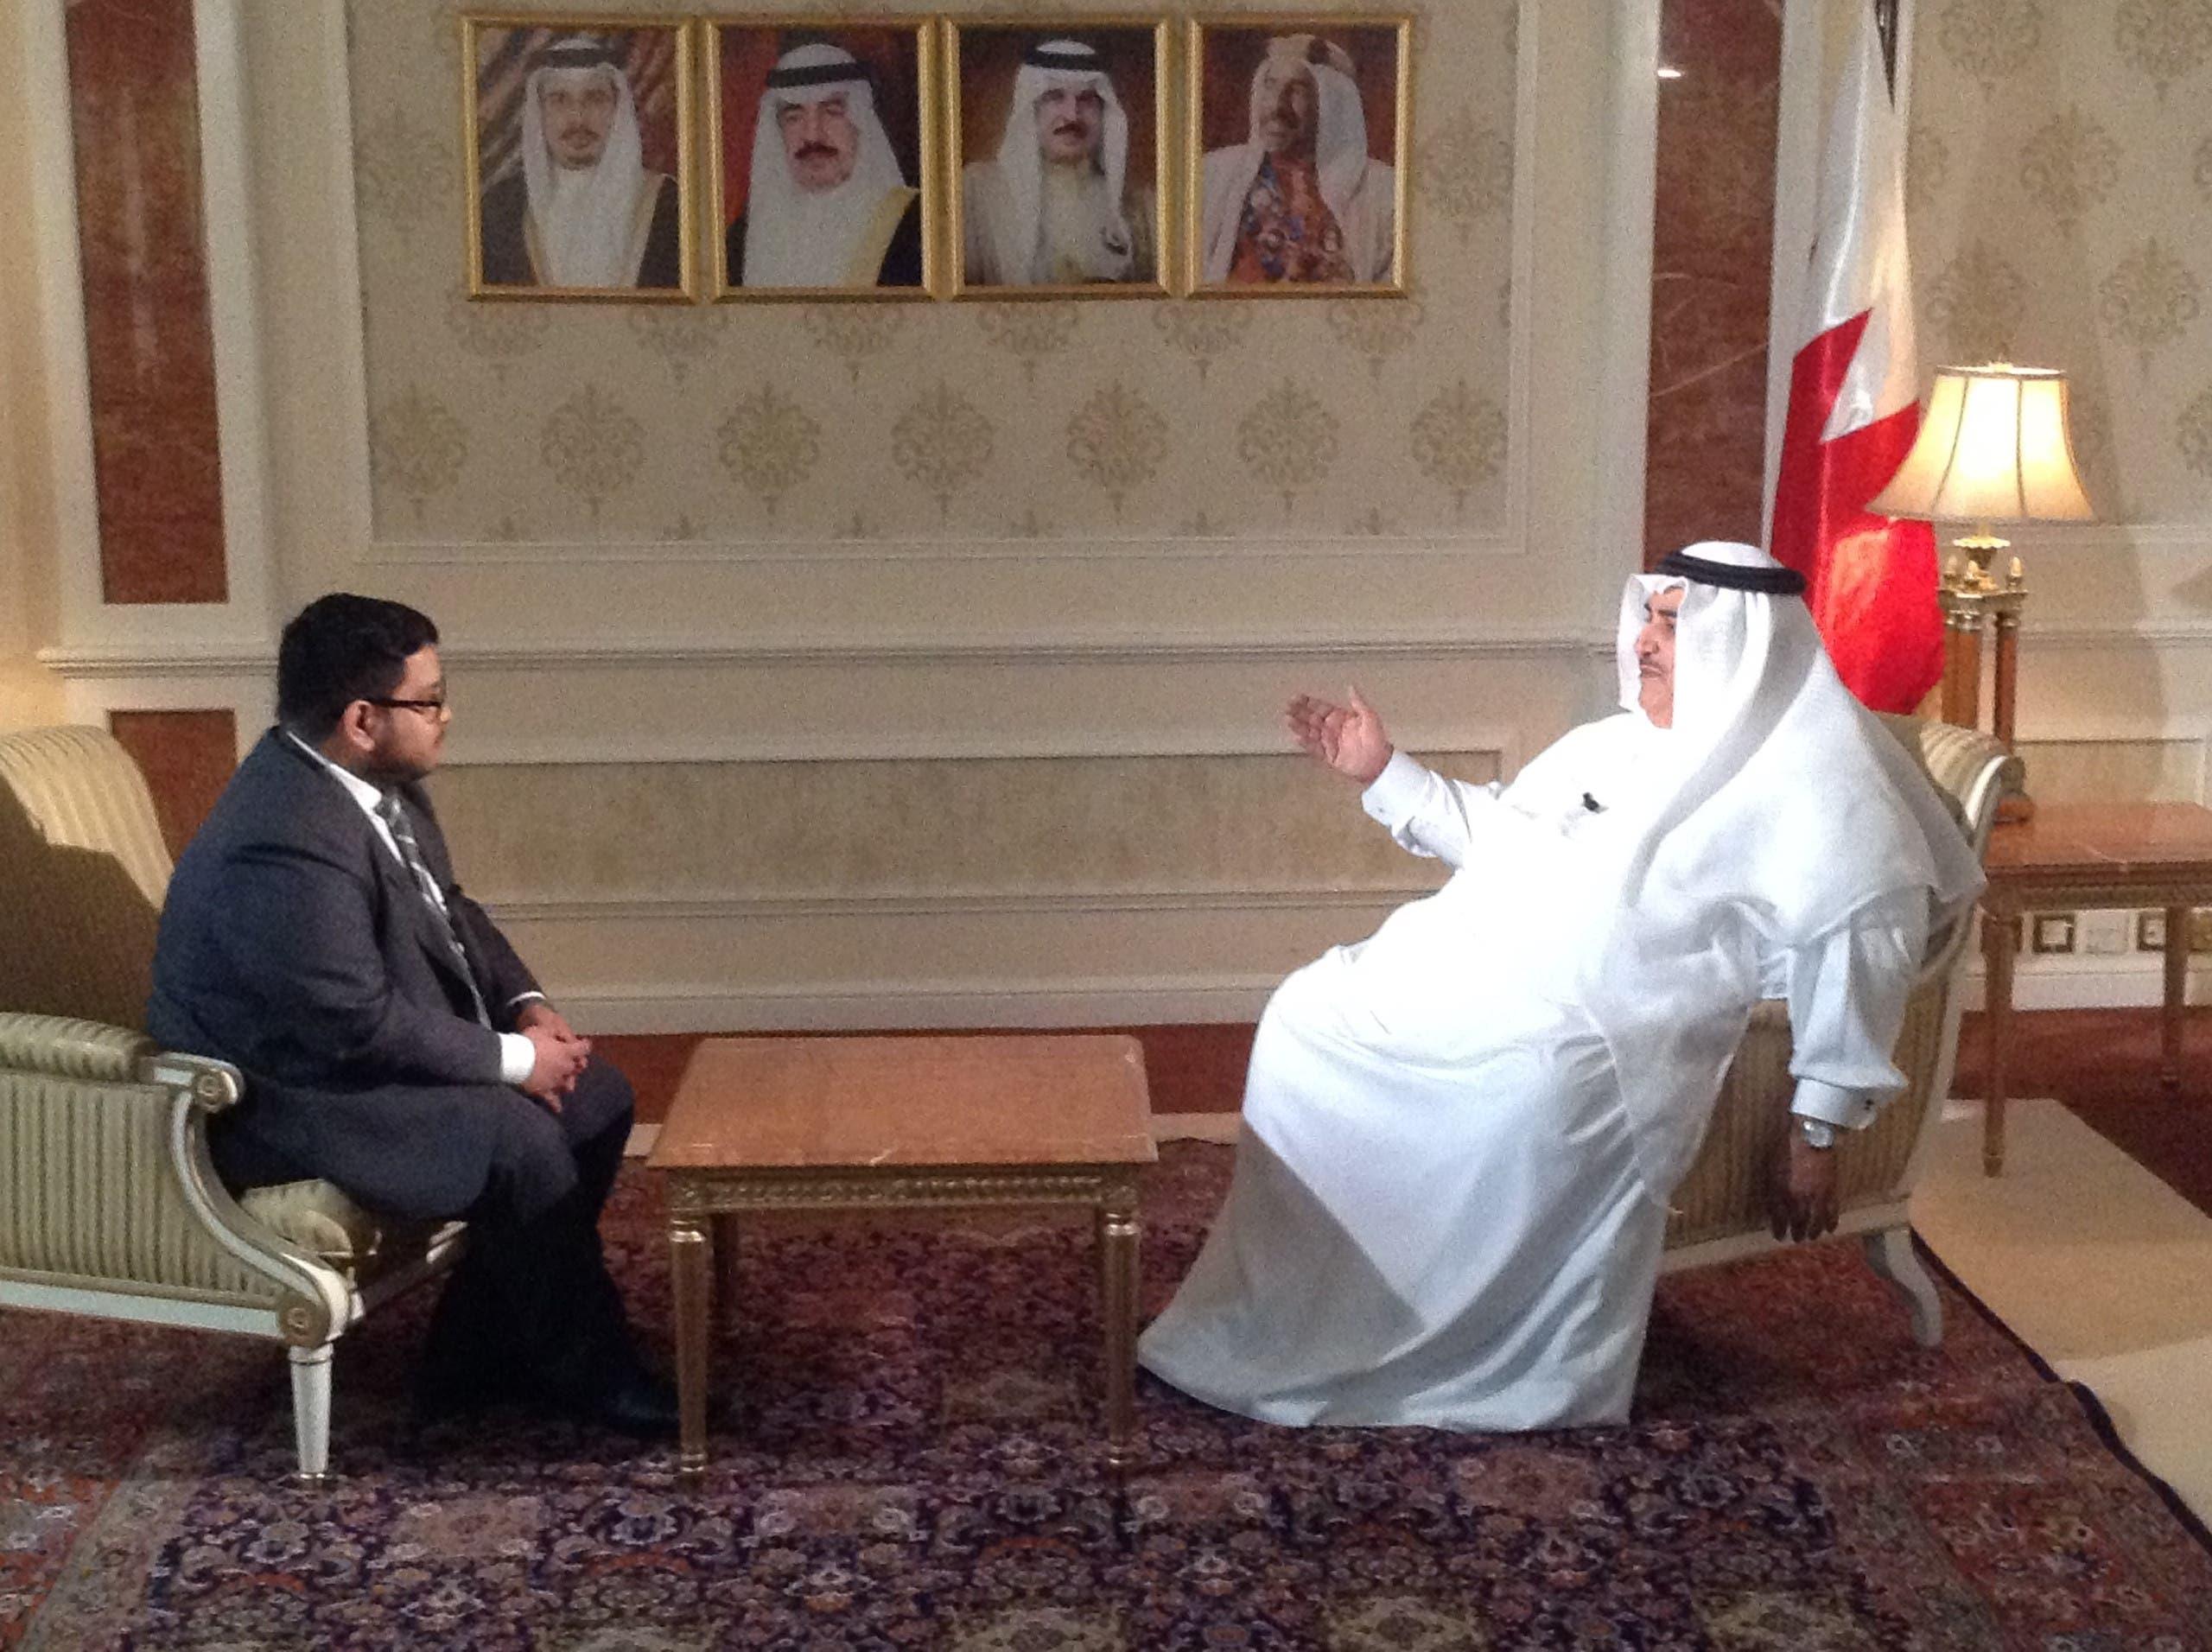 Al Arabiya English journalist Ismaeel Naar interviews Bahrain's Minister of Foreign Affairs Sheikh Khalid bin Ahmed Al Khalifa. (Al Arabiya)